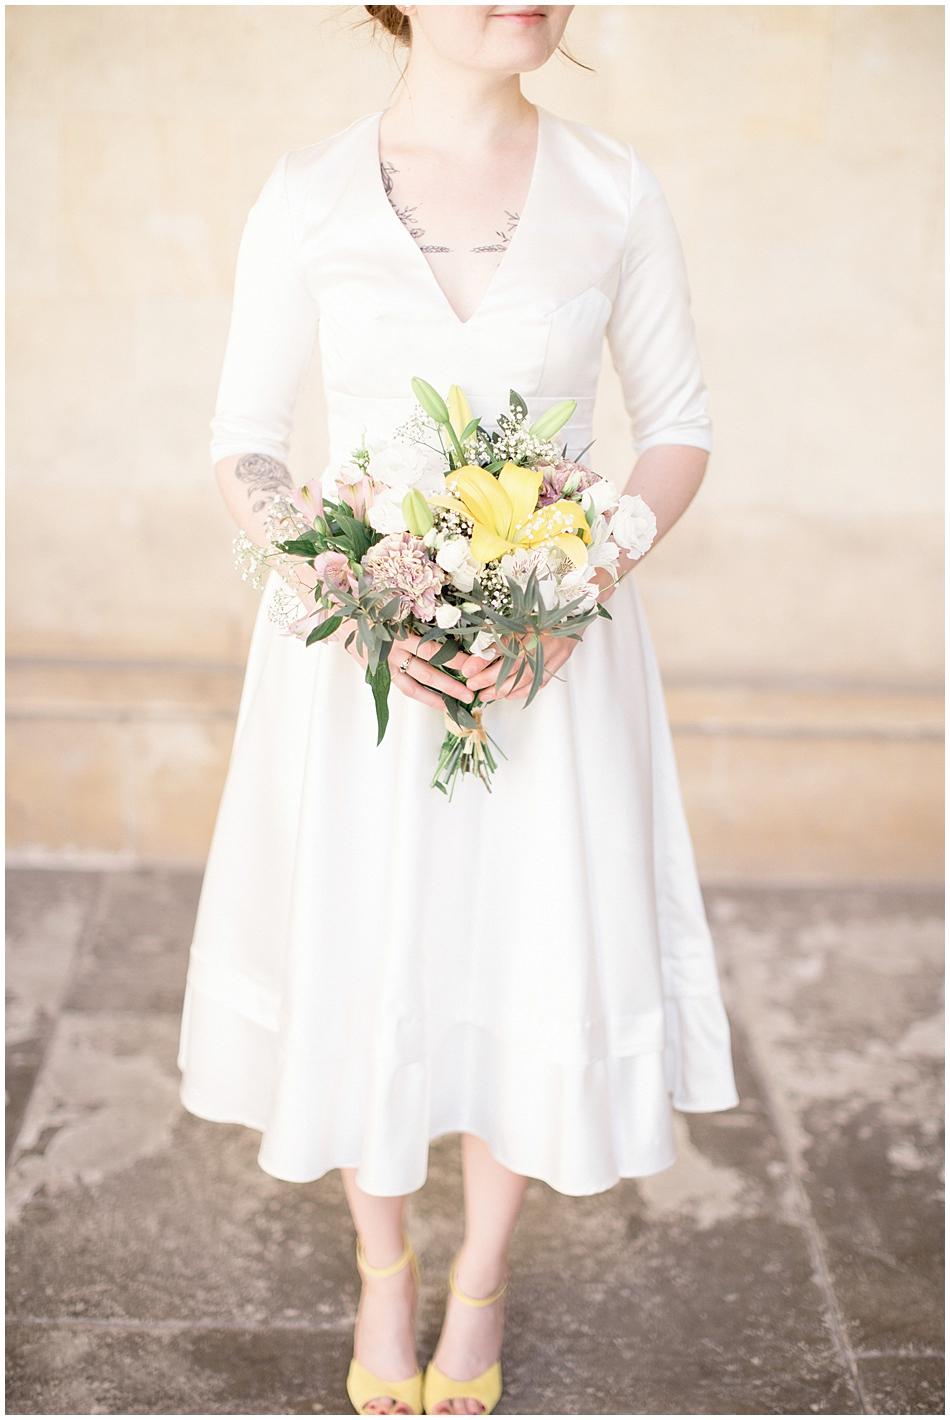 Marie-Alice G-Photographe Mariage France Normandie - Photographe Mariage Manche valognes cherbourg - Wedding Photographer France_0175